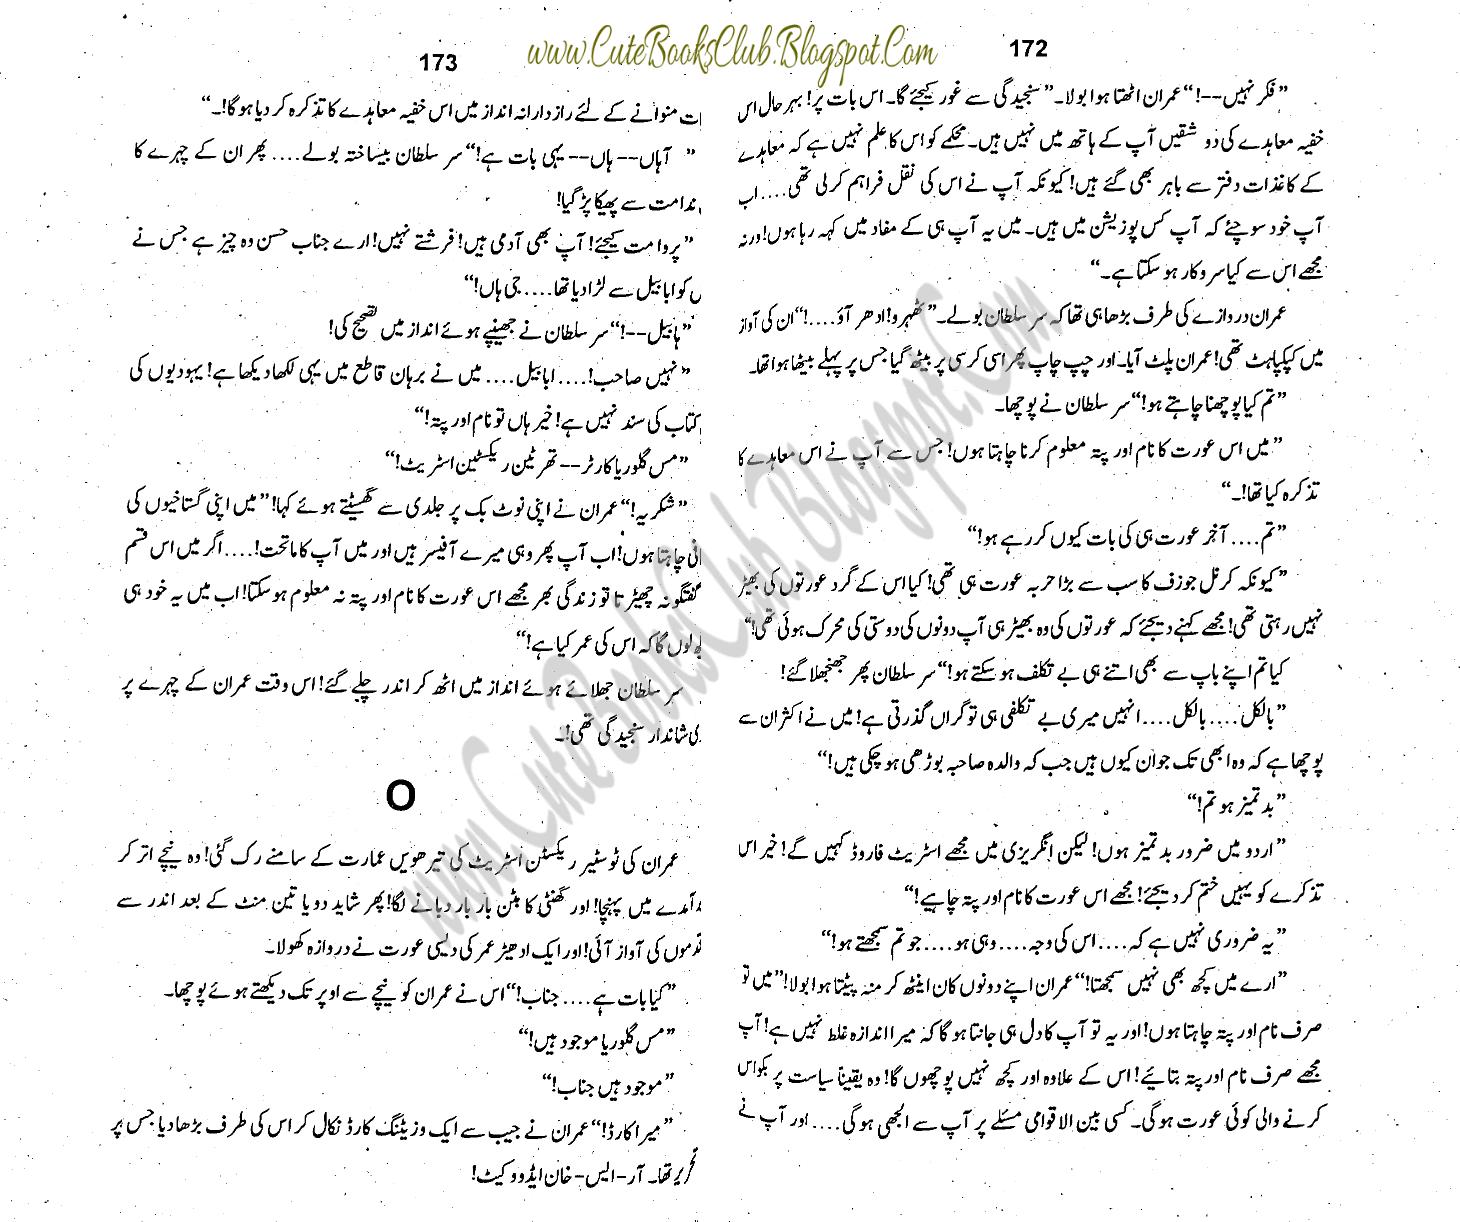 013-Qabar Aur Khanjer, Imran Series By Ibne Safi (Urdu